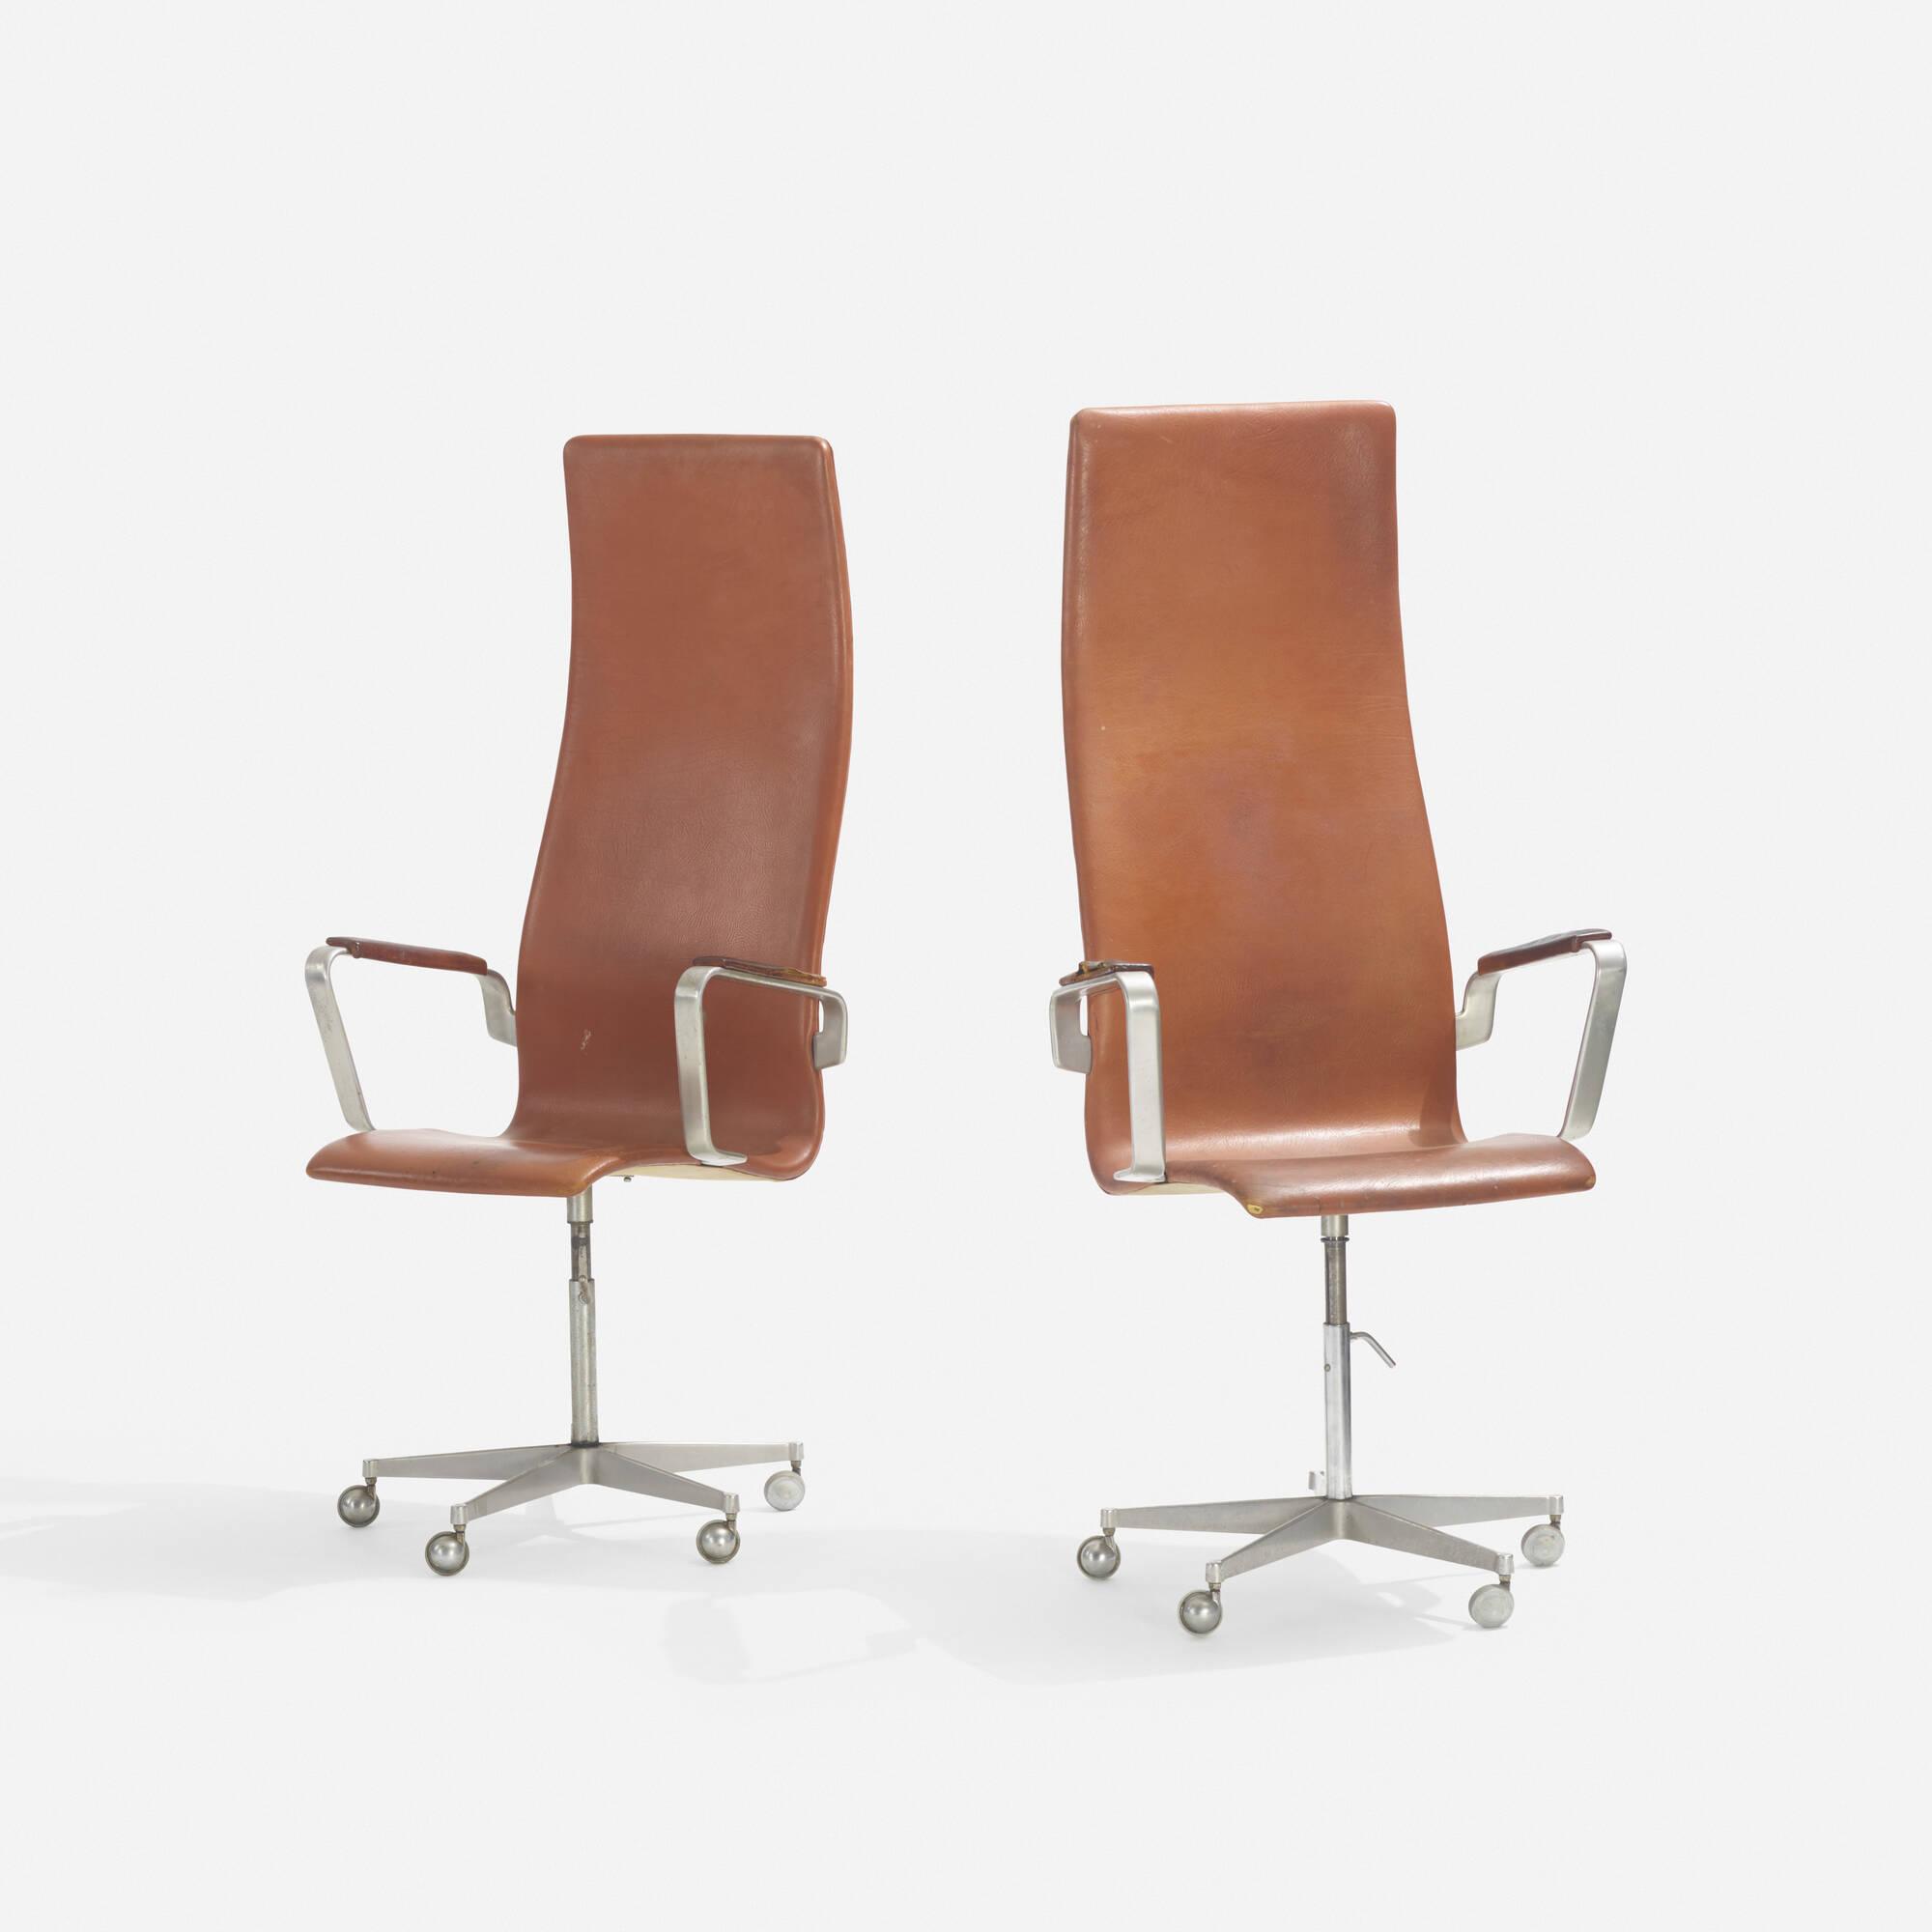 223: Arne Jacobsen / Oxford armchairs, pair (1 of 2)